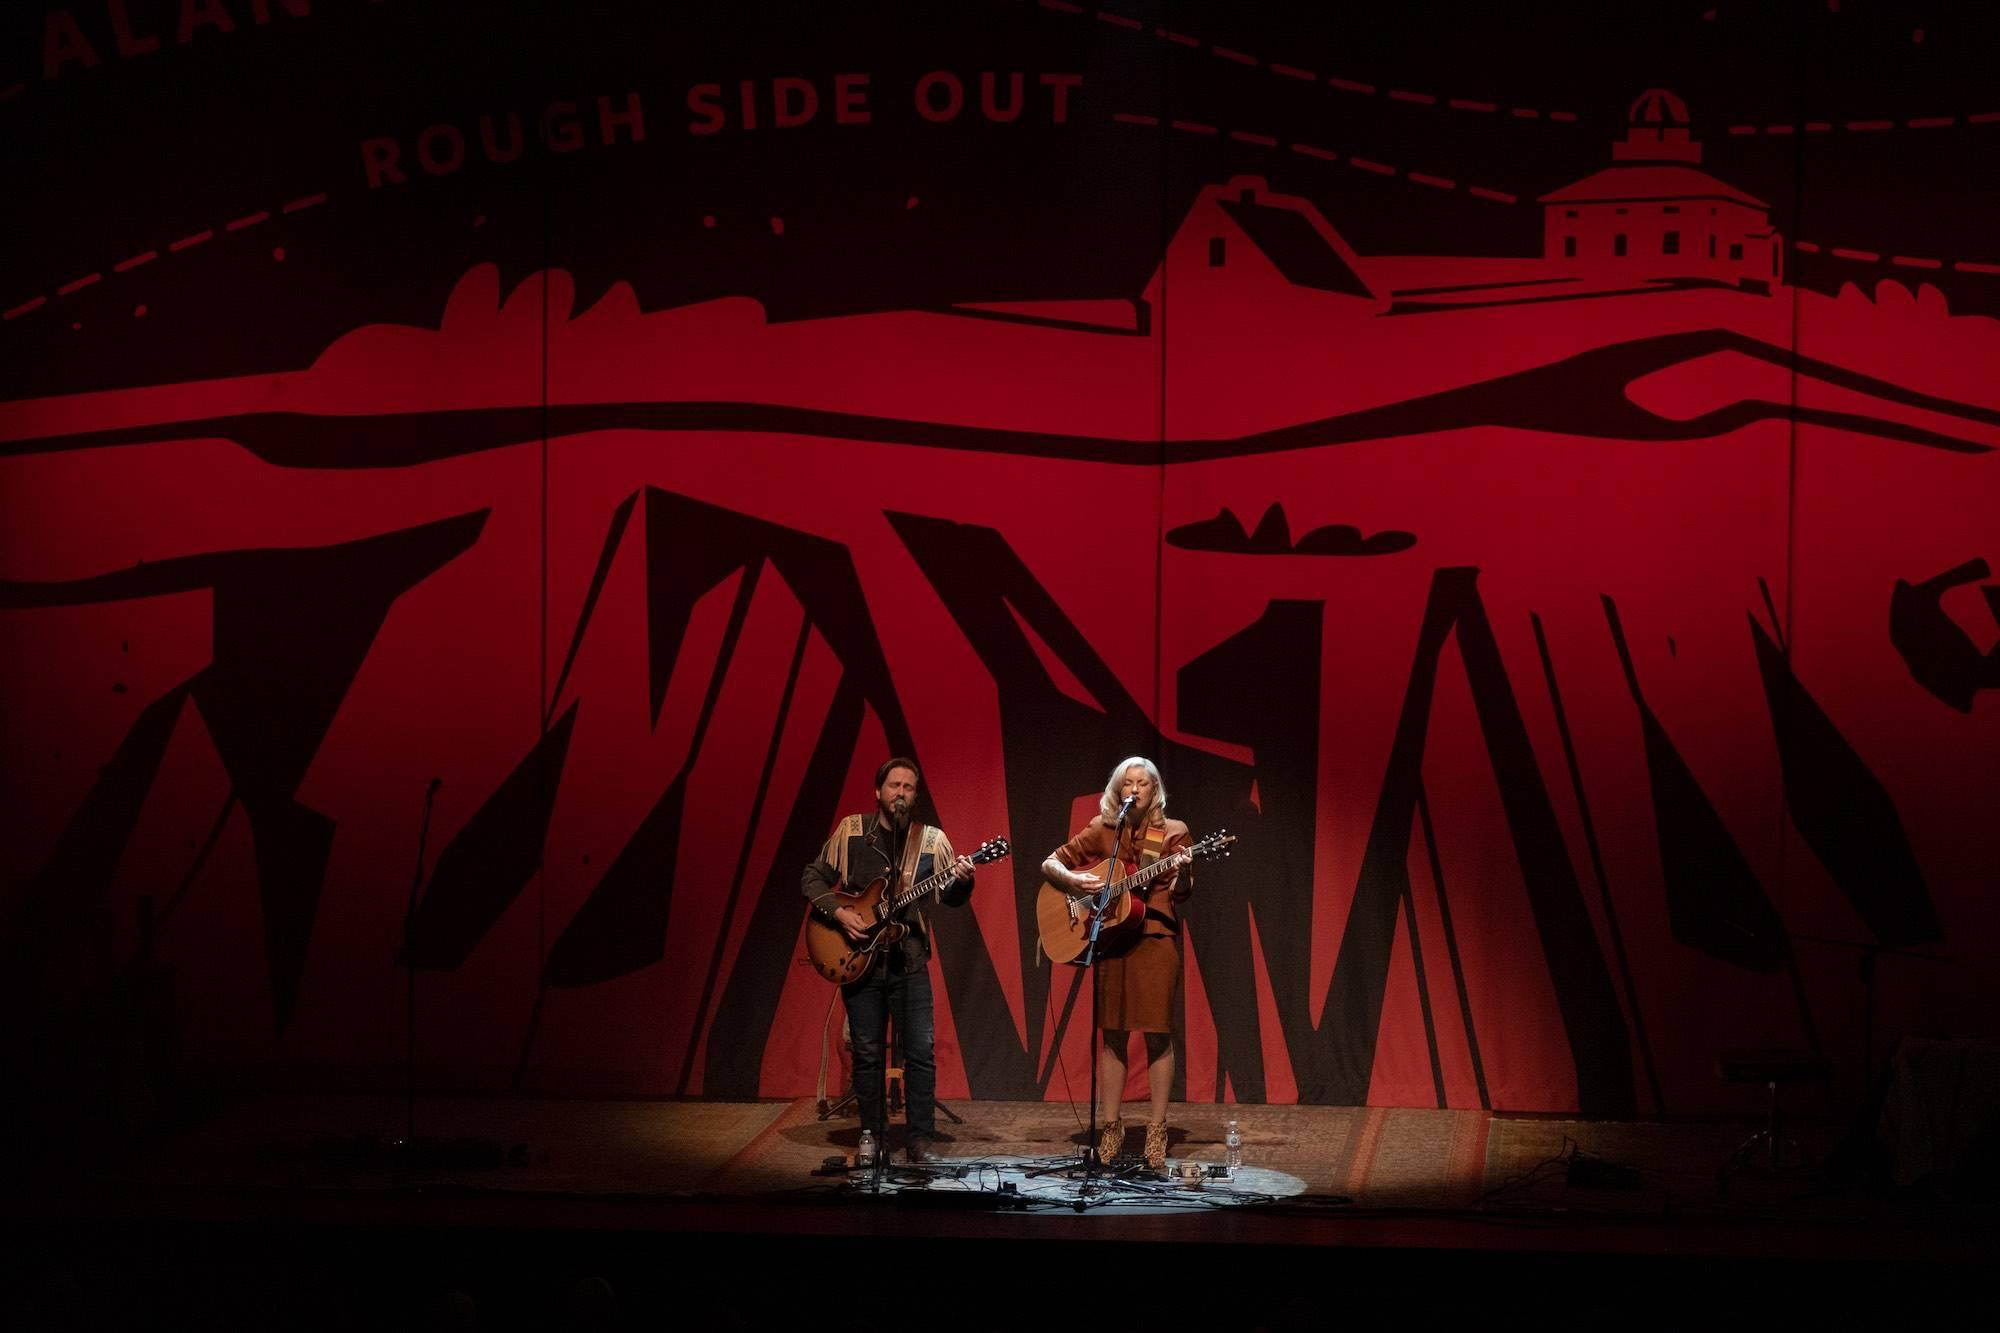 Kelly Prescott at Queen Elizabeth Theatre, Vancouver, Mar 8, 2020. Scott Alexander photo.